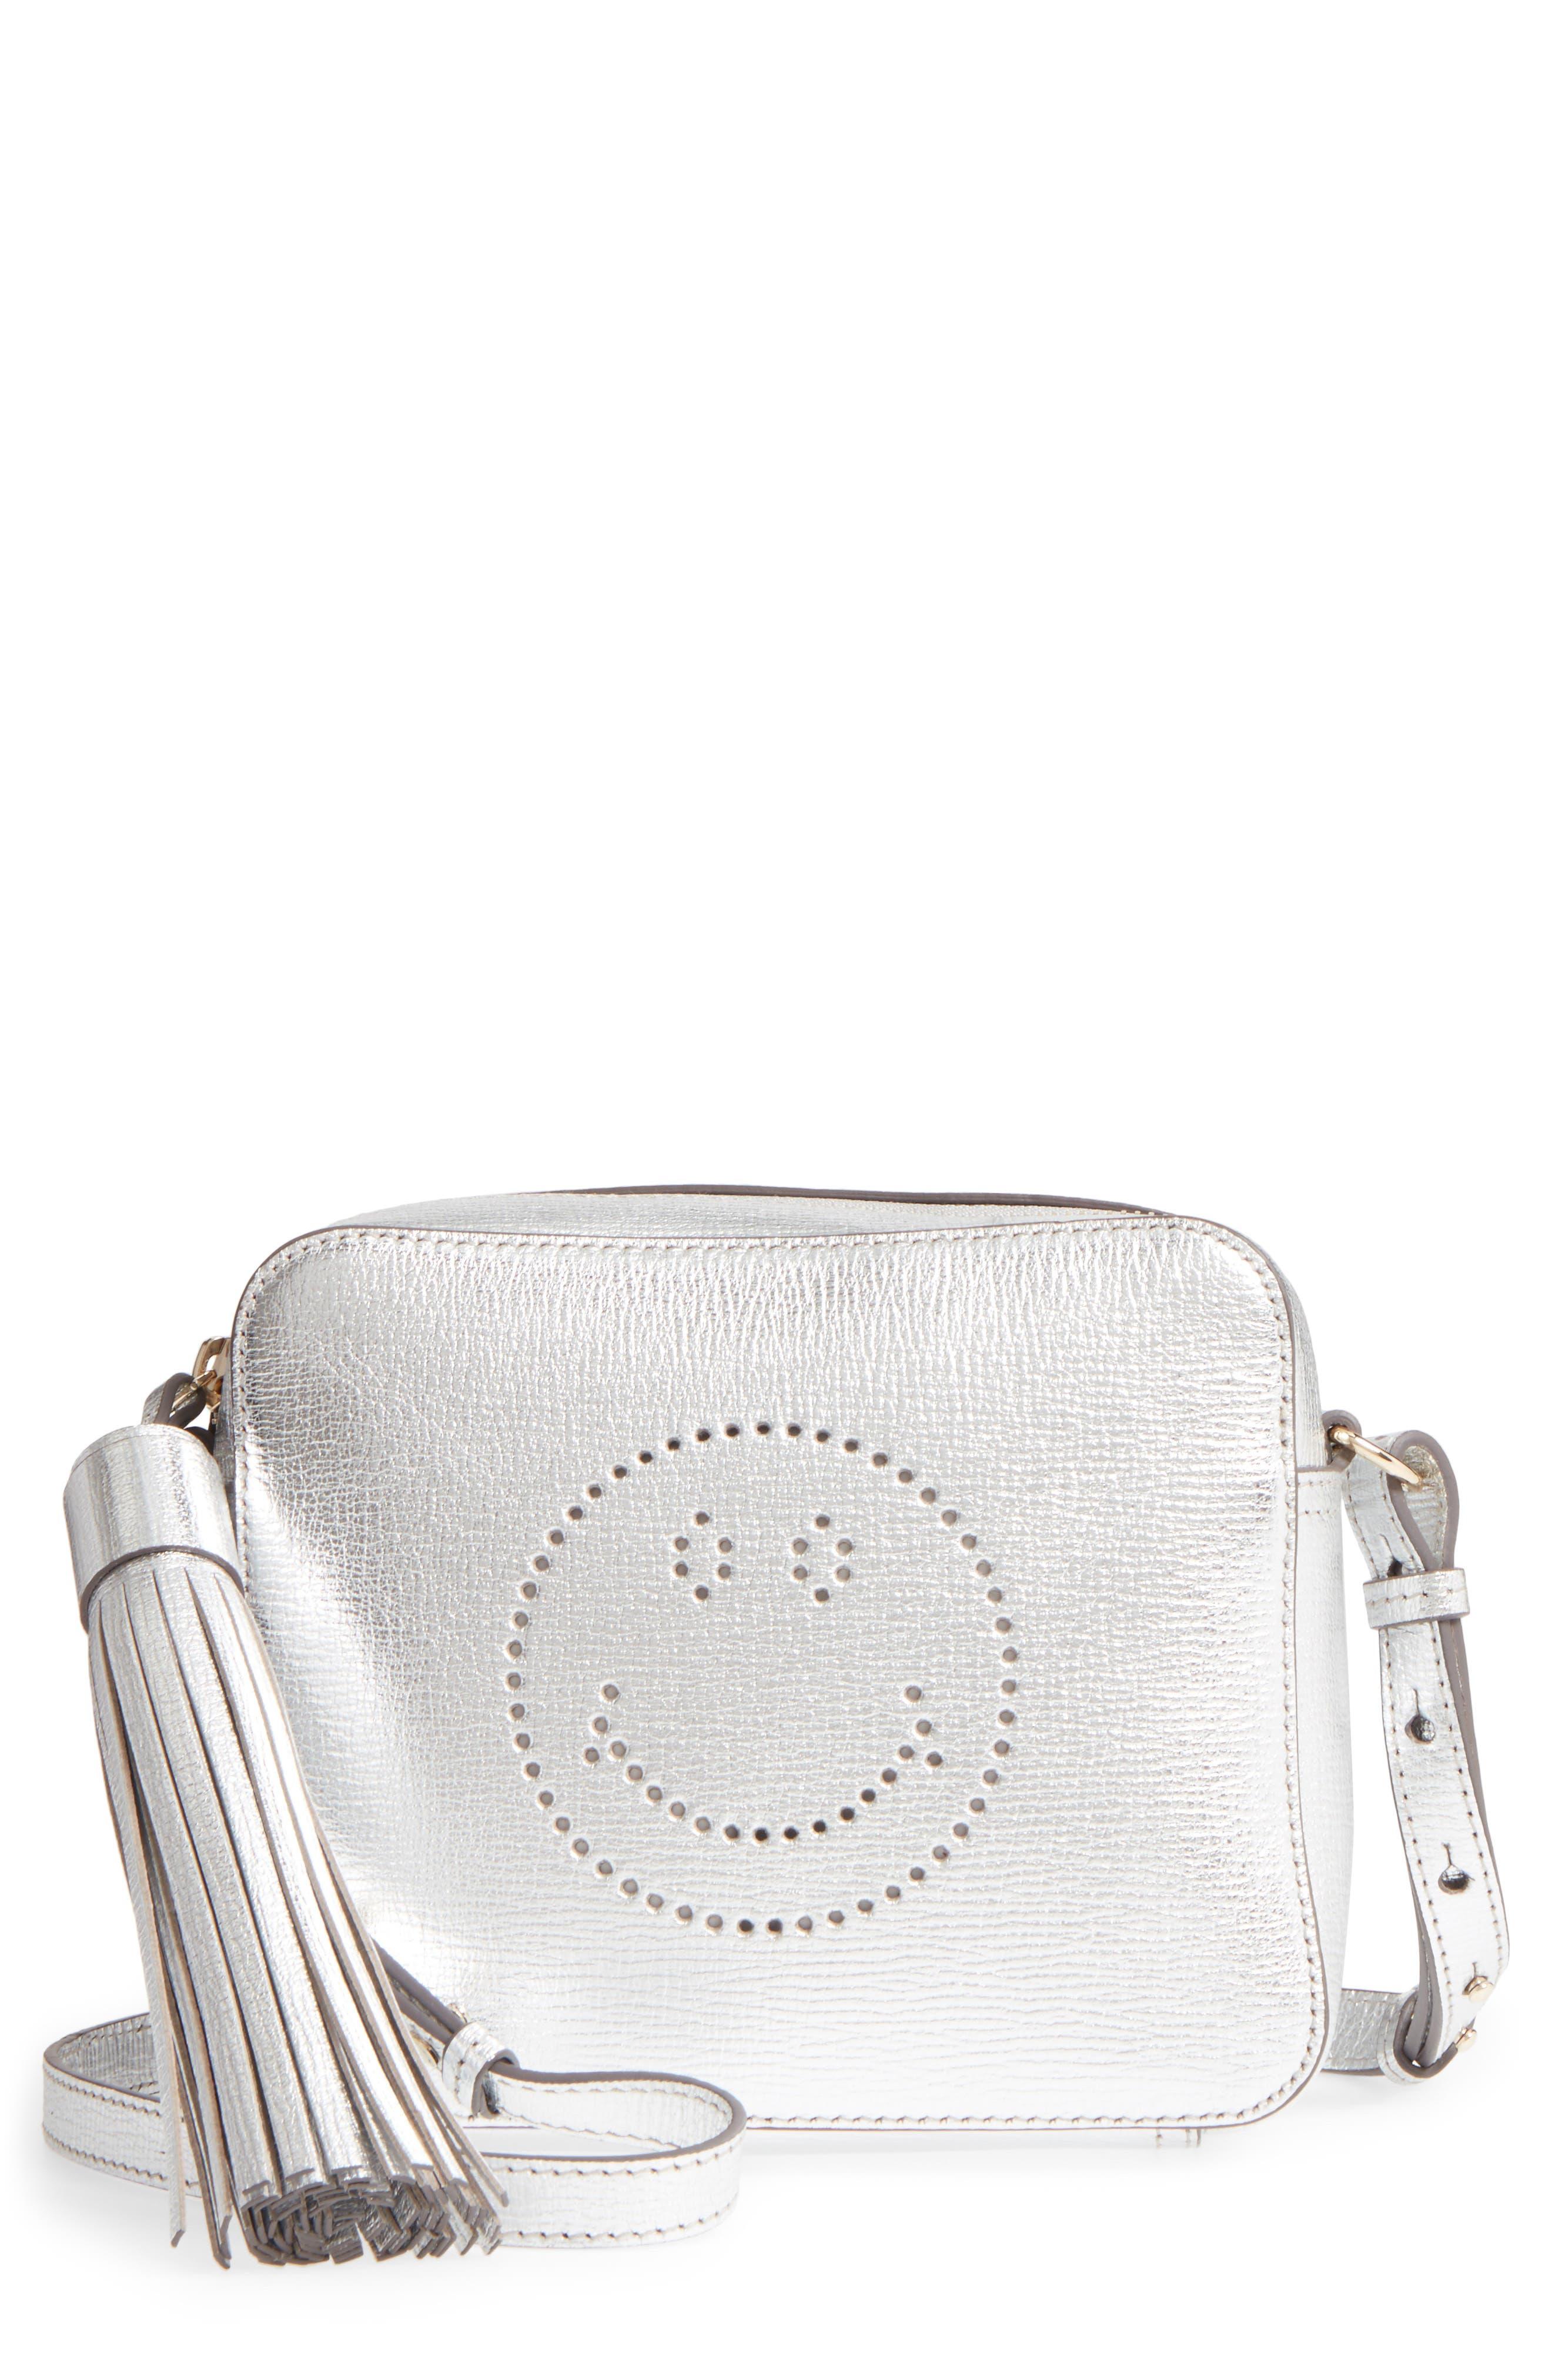 Smiley Metallic Leather Crossbody Bag,                             Main thumbnail 1, color,                             SILVER